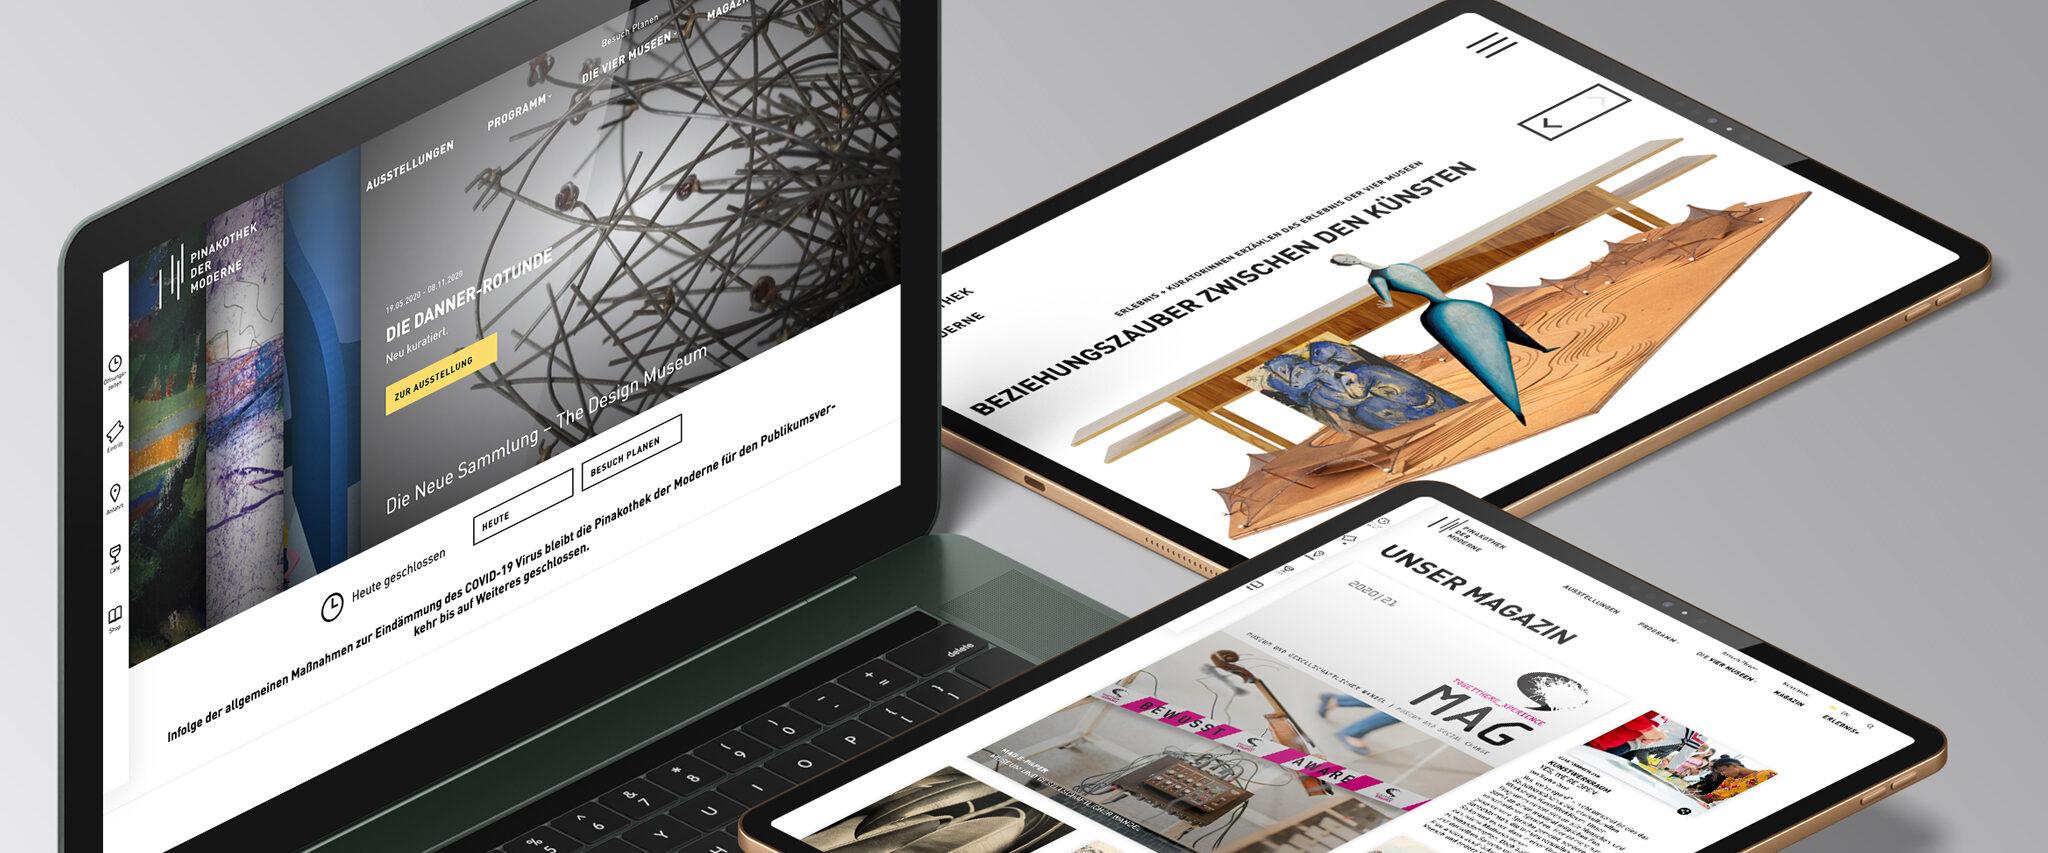 Website der Pinakothek